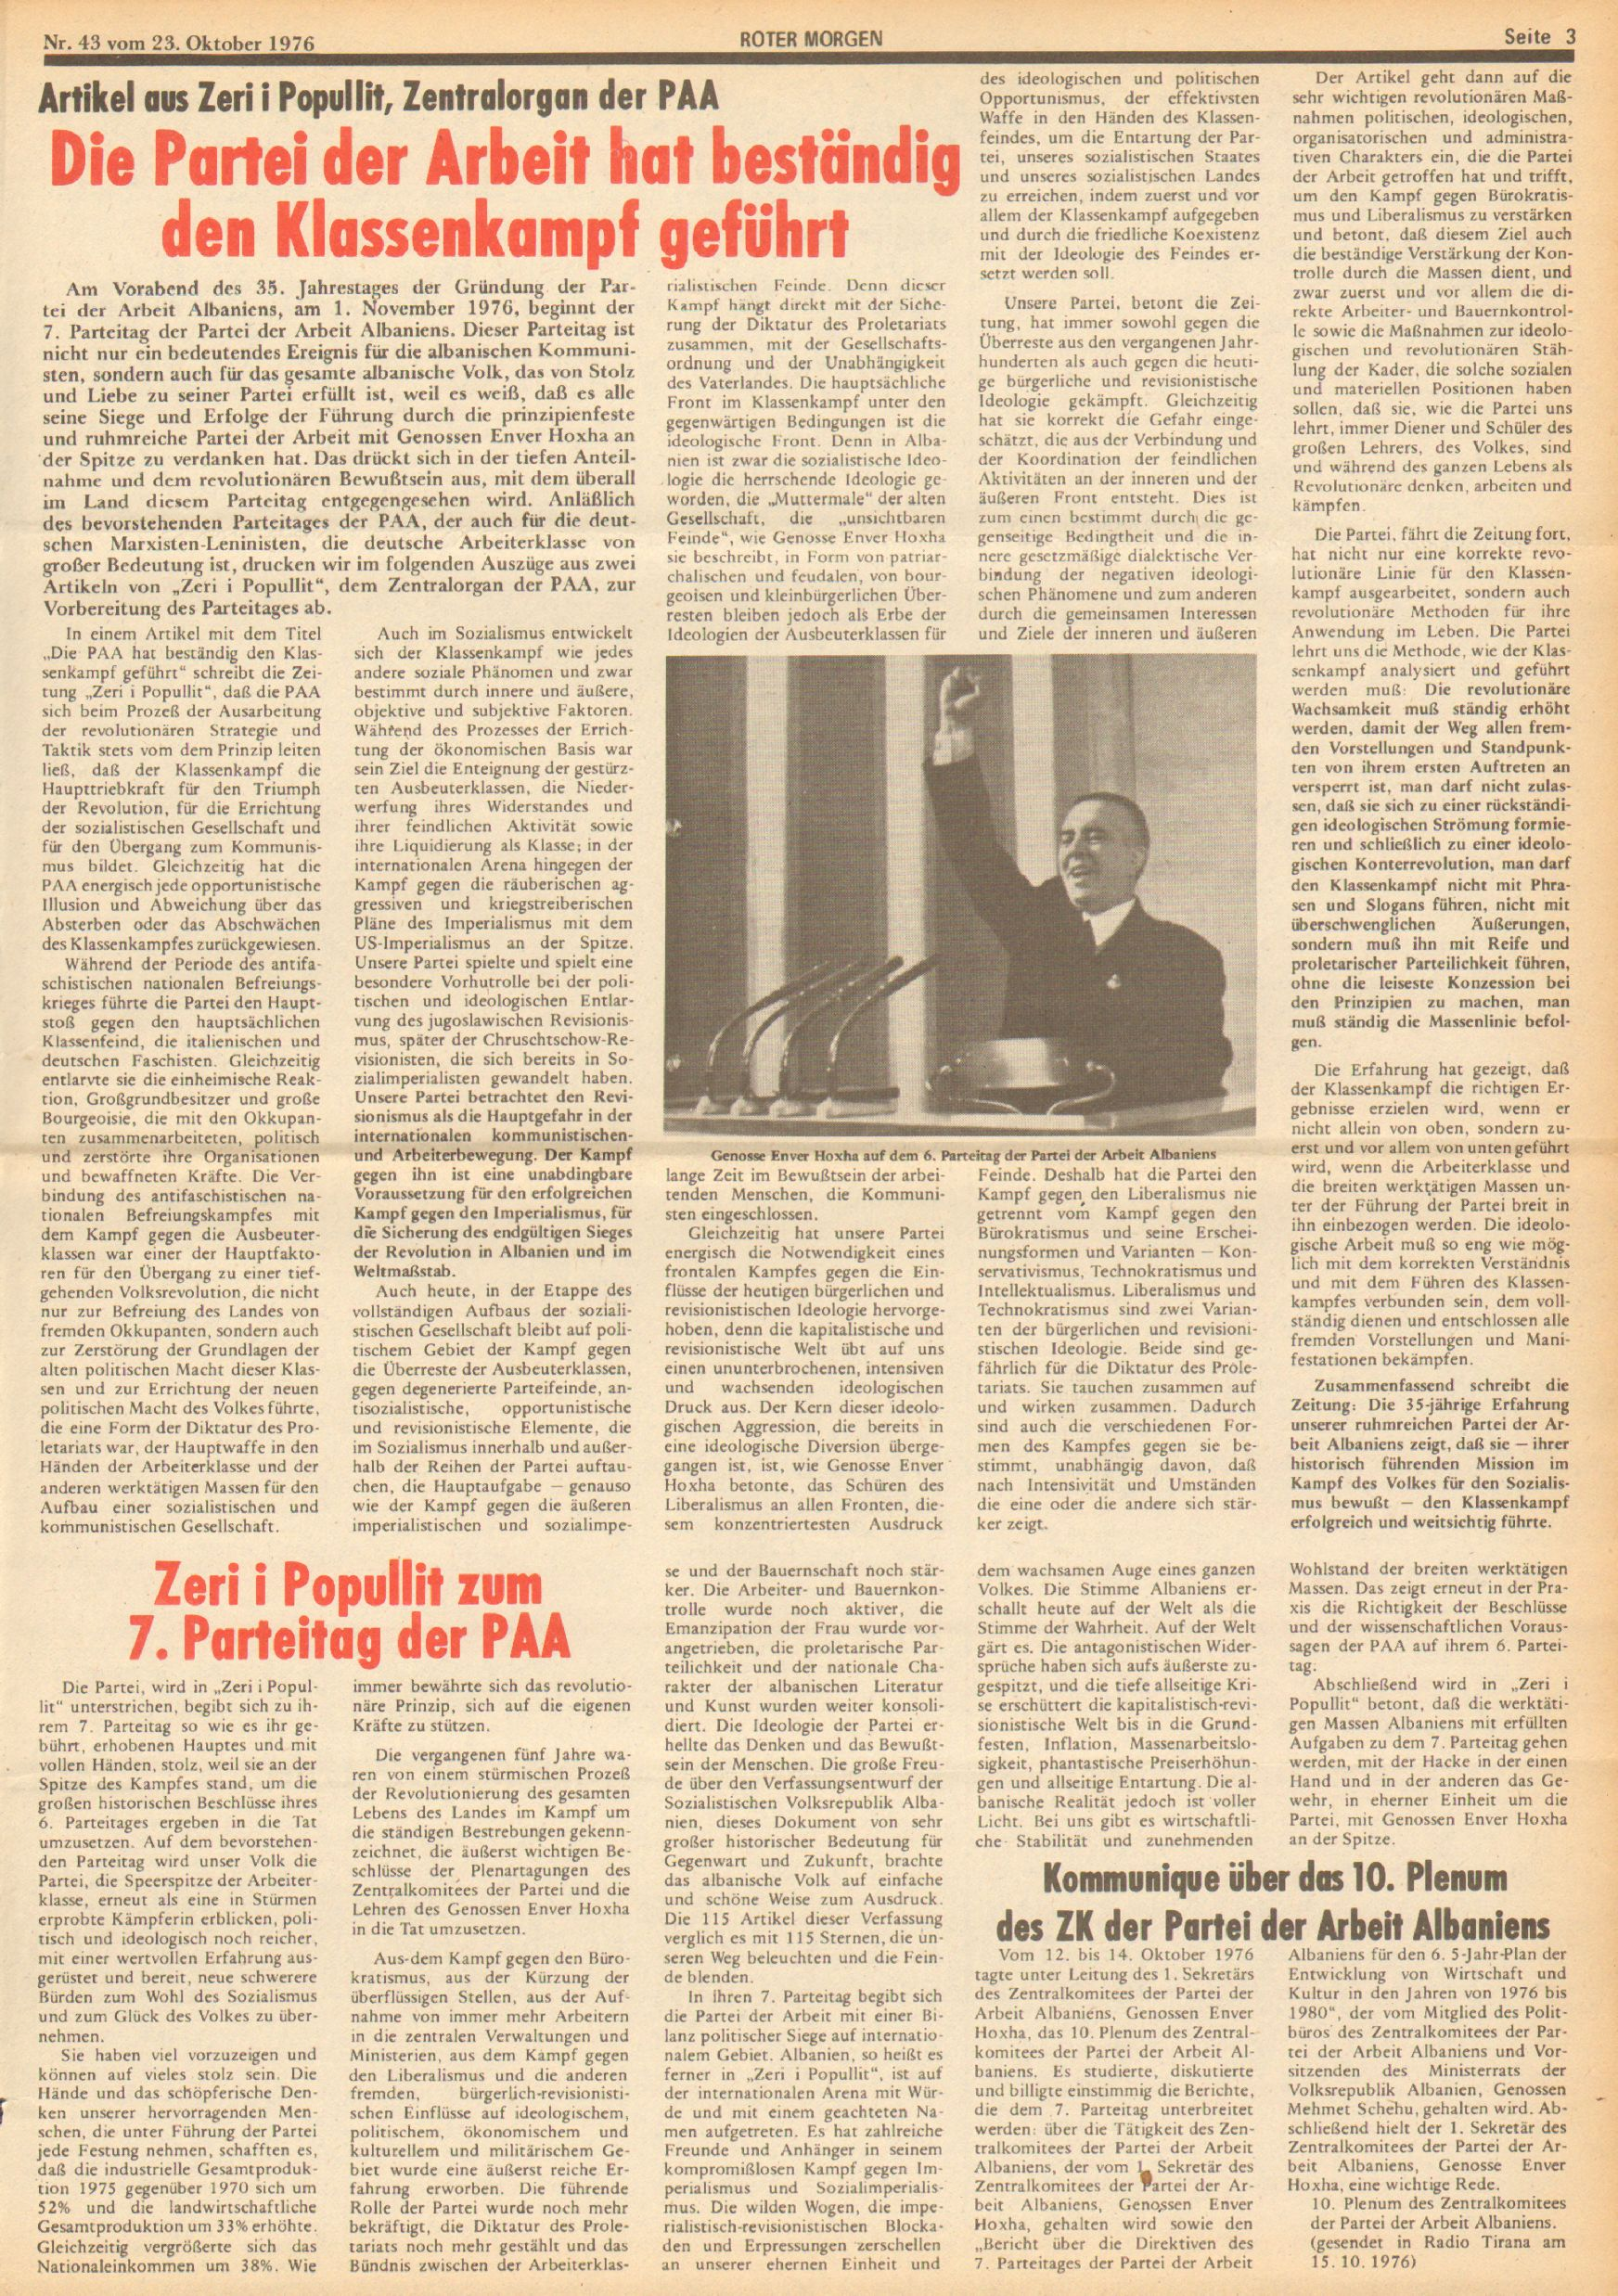 Roter Morgen, 10. Jg., 23. Oktober 1976, Nr. 43, Seite 3